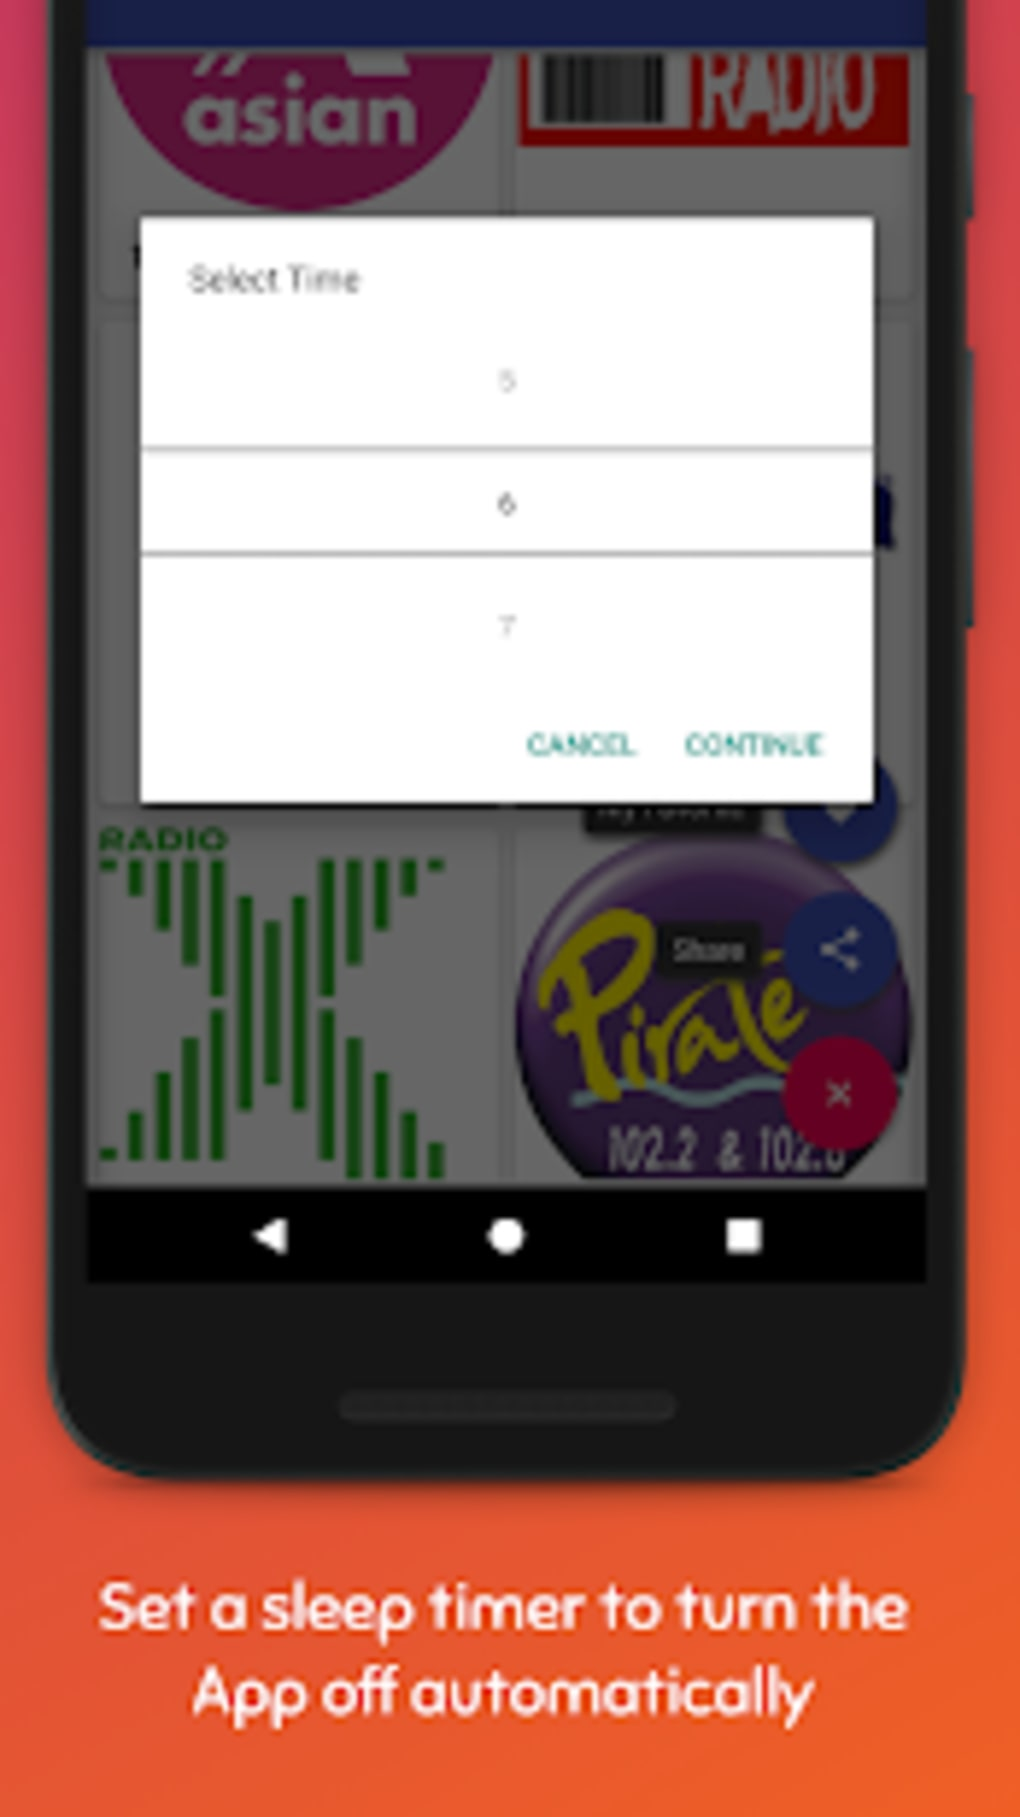 ... UK Radio Stations Live British Online Radio App